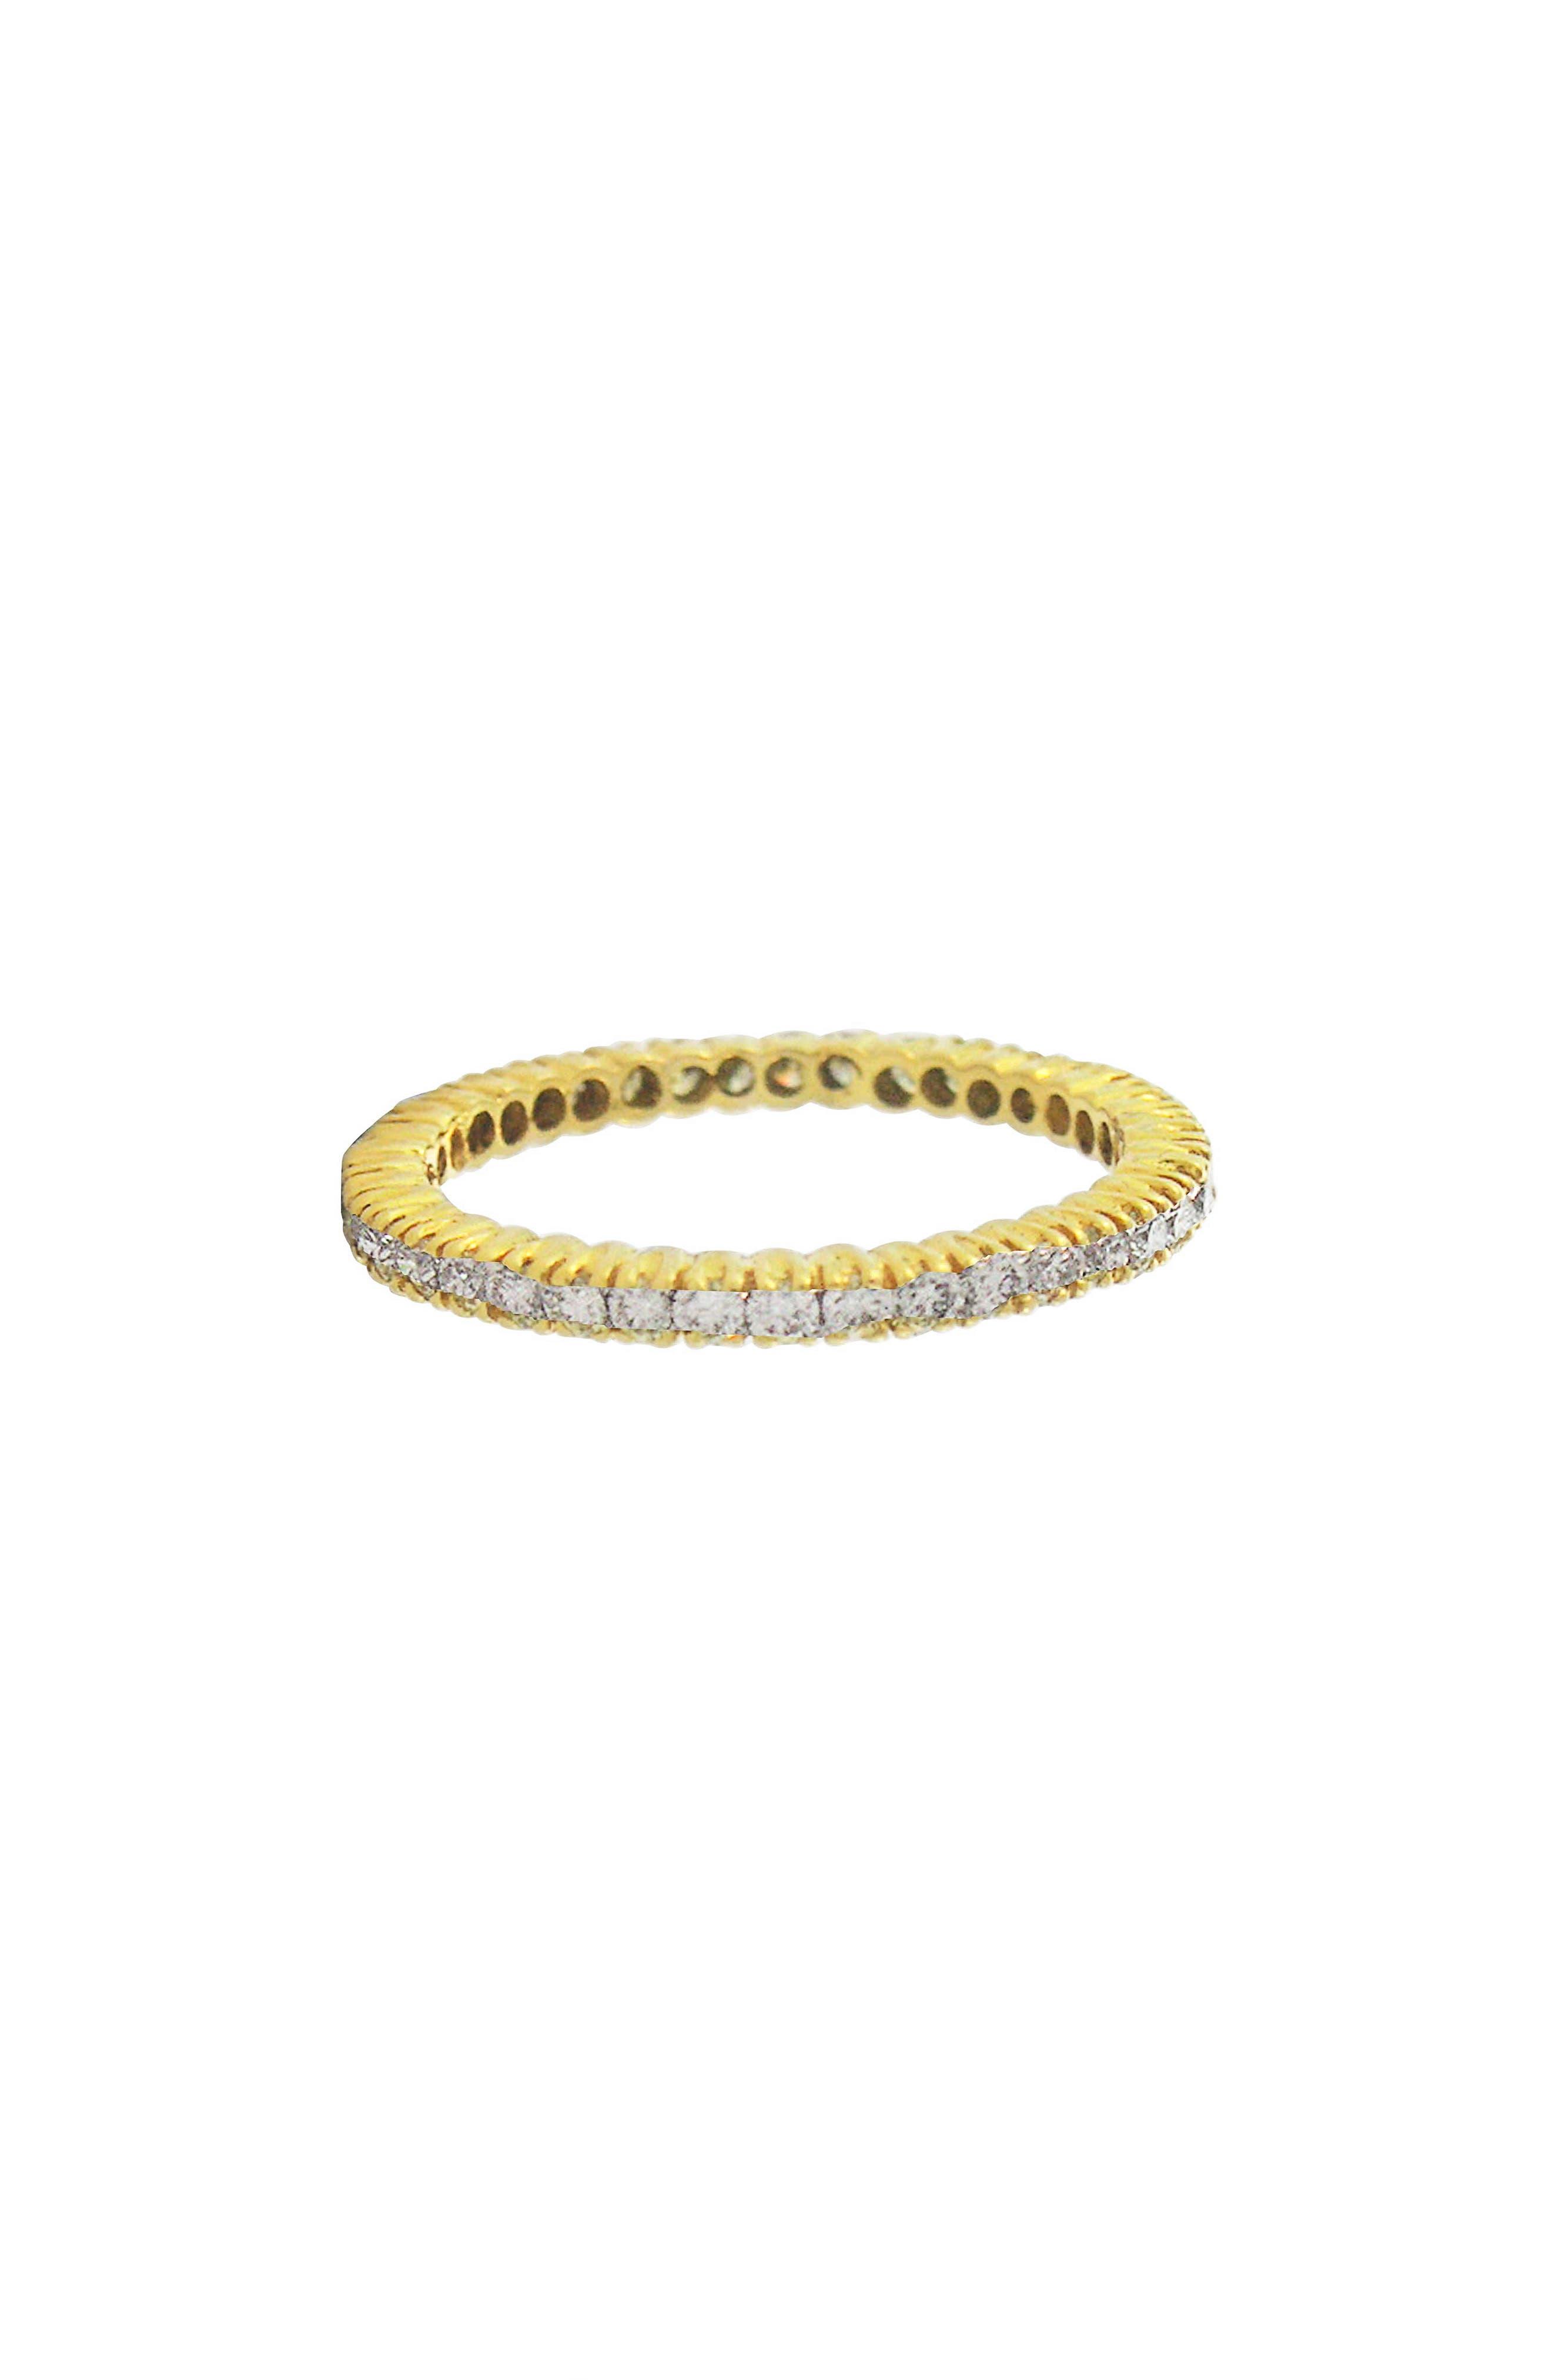 Prong Set Diamond Eternity Band,                             Main thumbnail 1, color,                             GOLD/ DIAMOND